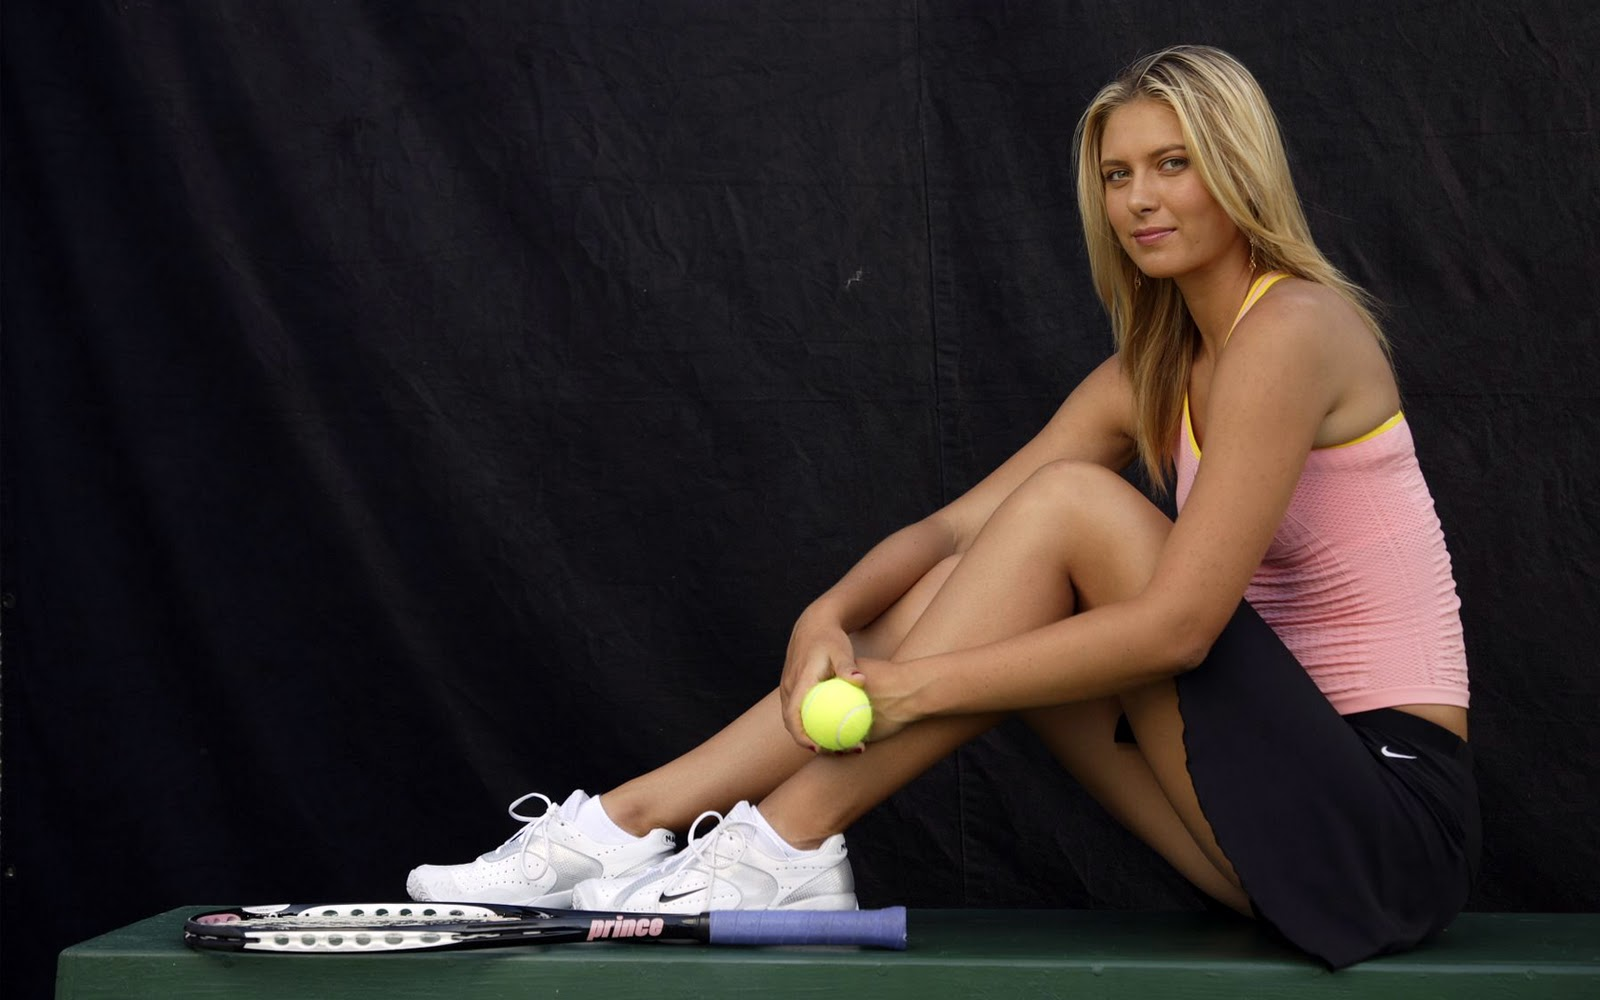 Saria Sharapova Tennis Wallpaper